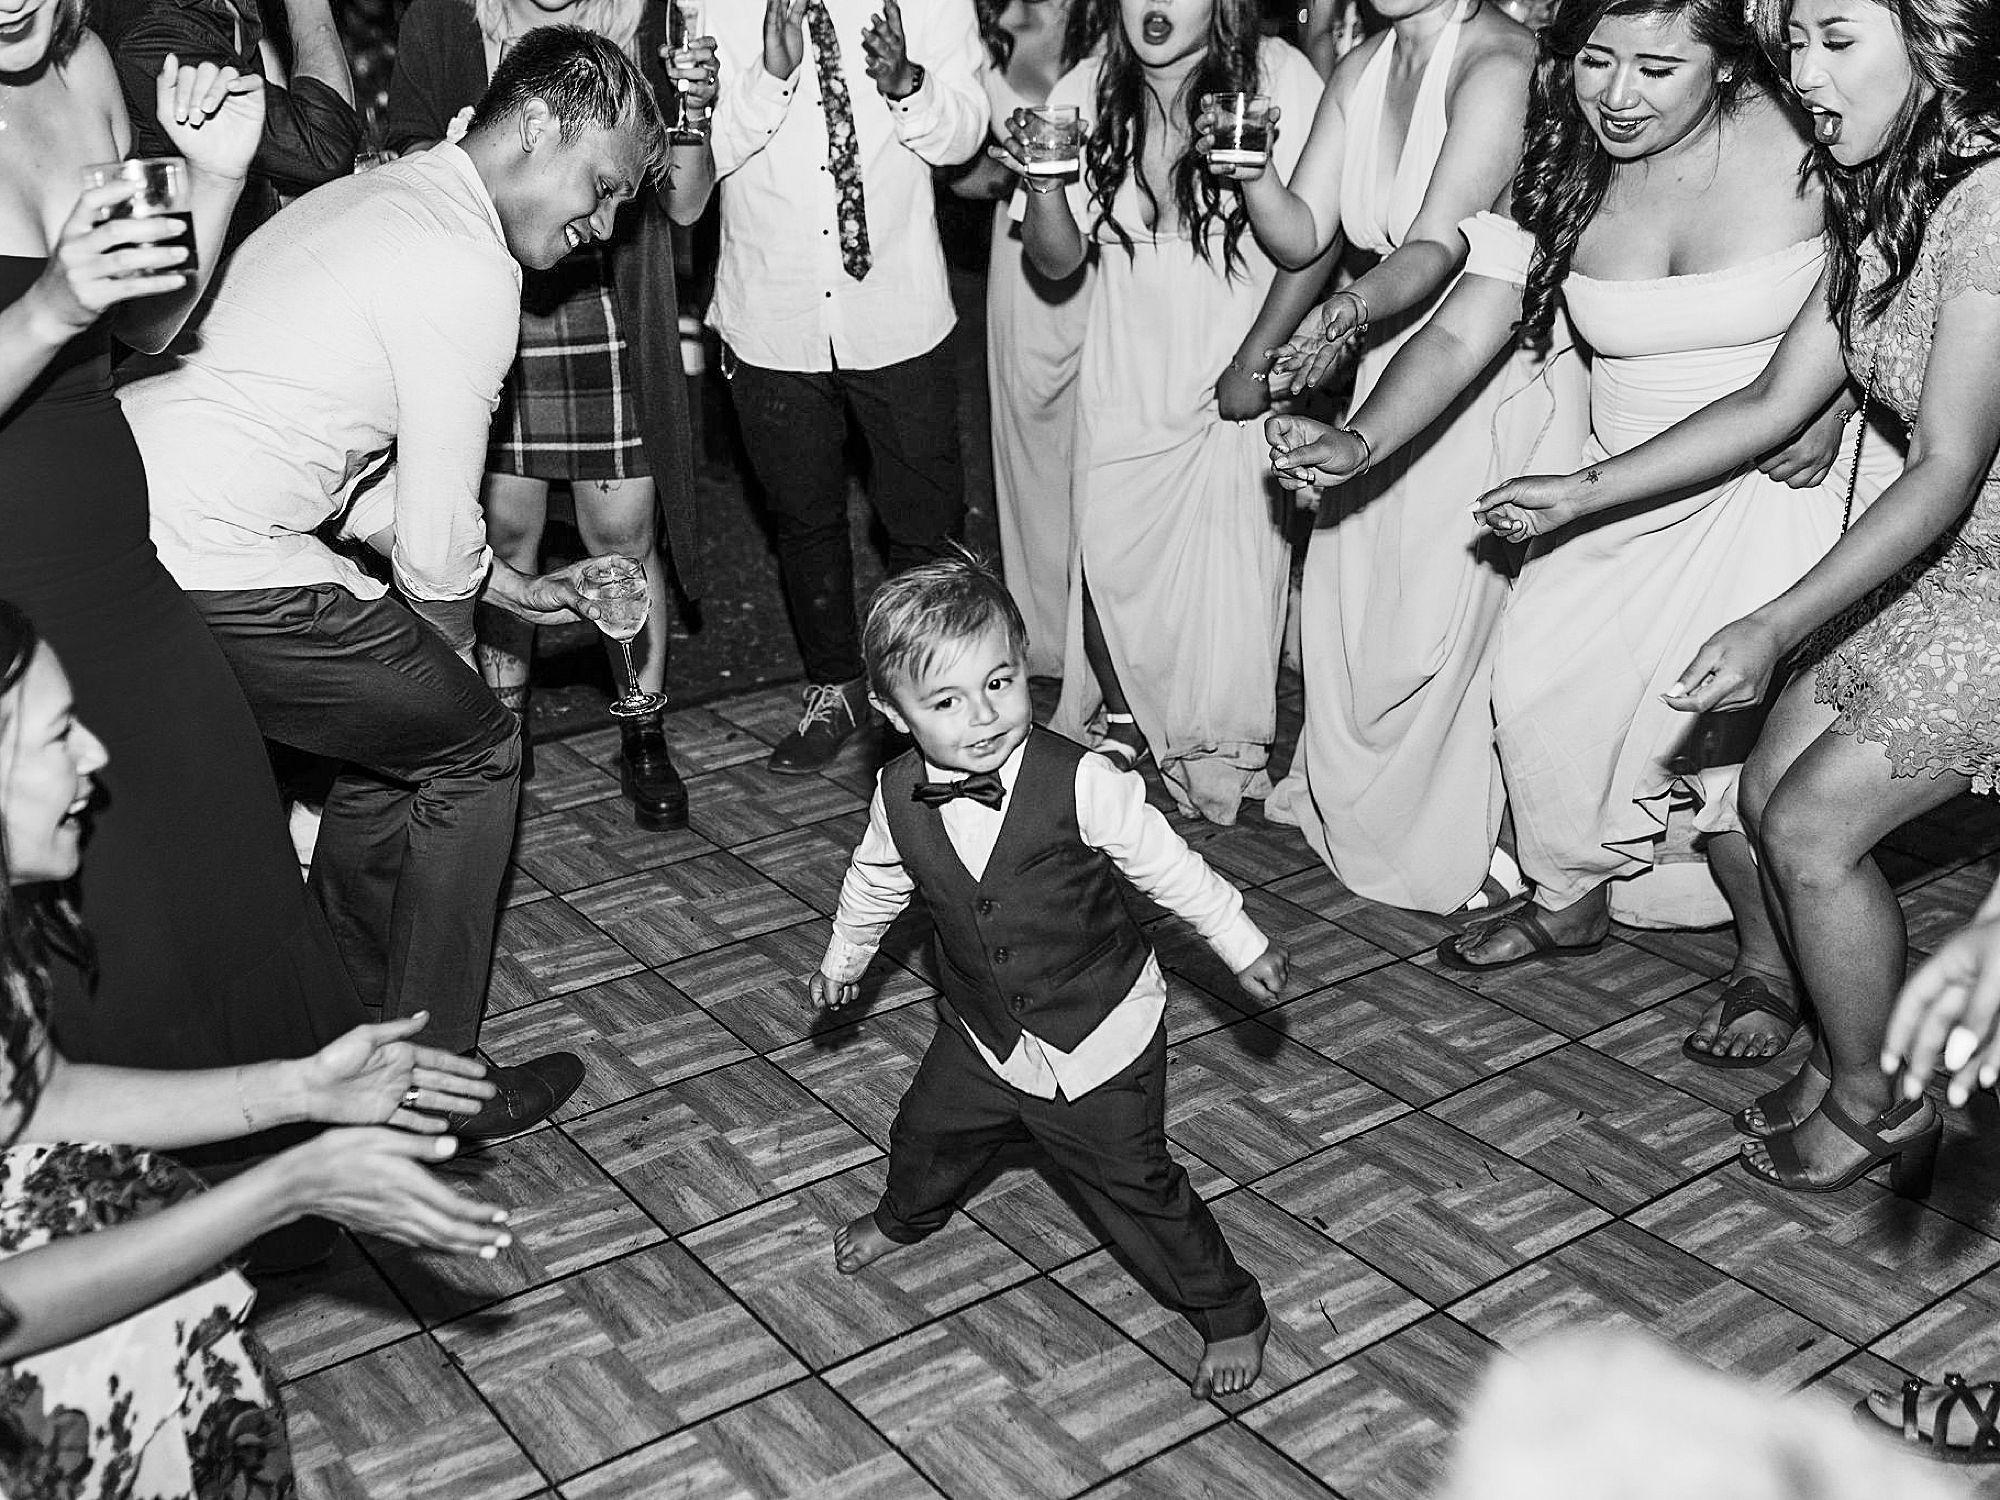 MITCHELLS MOUNTAIN MEADOWS Wedding - Ash Baumgartner - Phallina and Matt - Sierraville Wedding - Tahoe Wedding Photography_0035.jpg